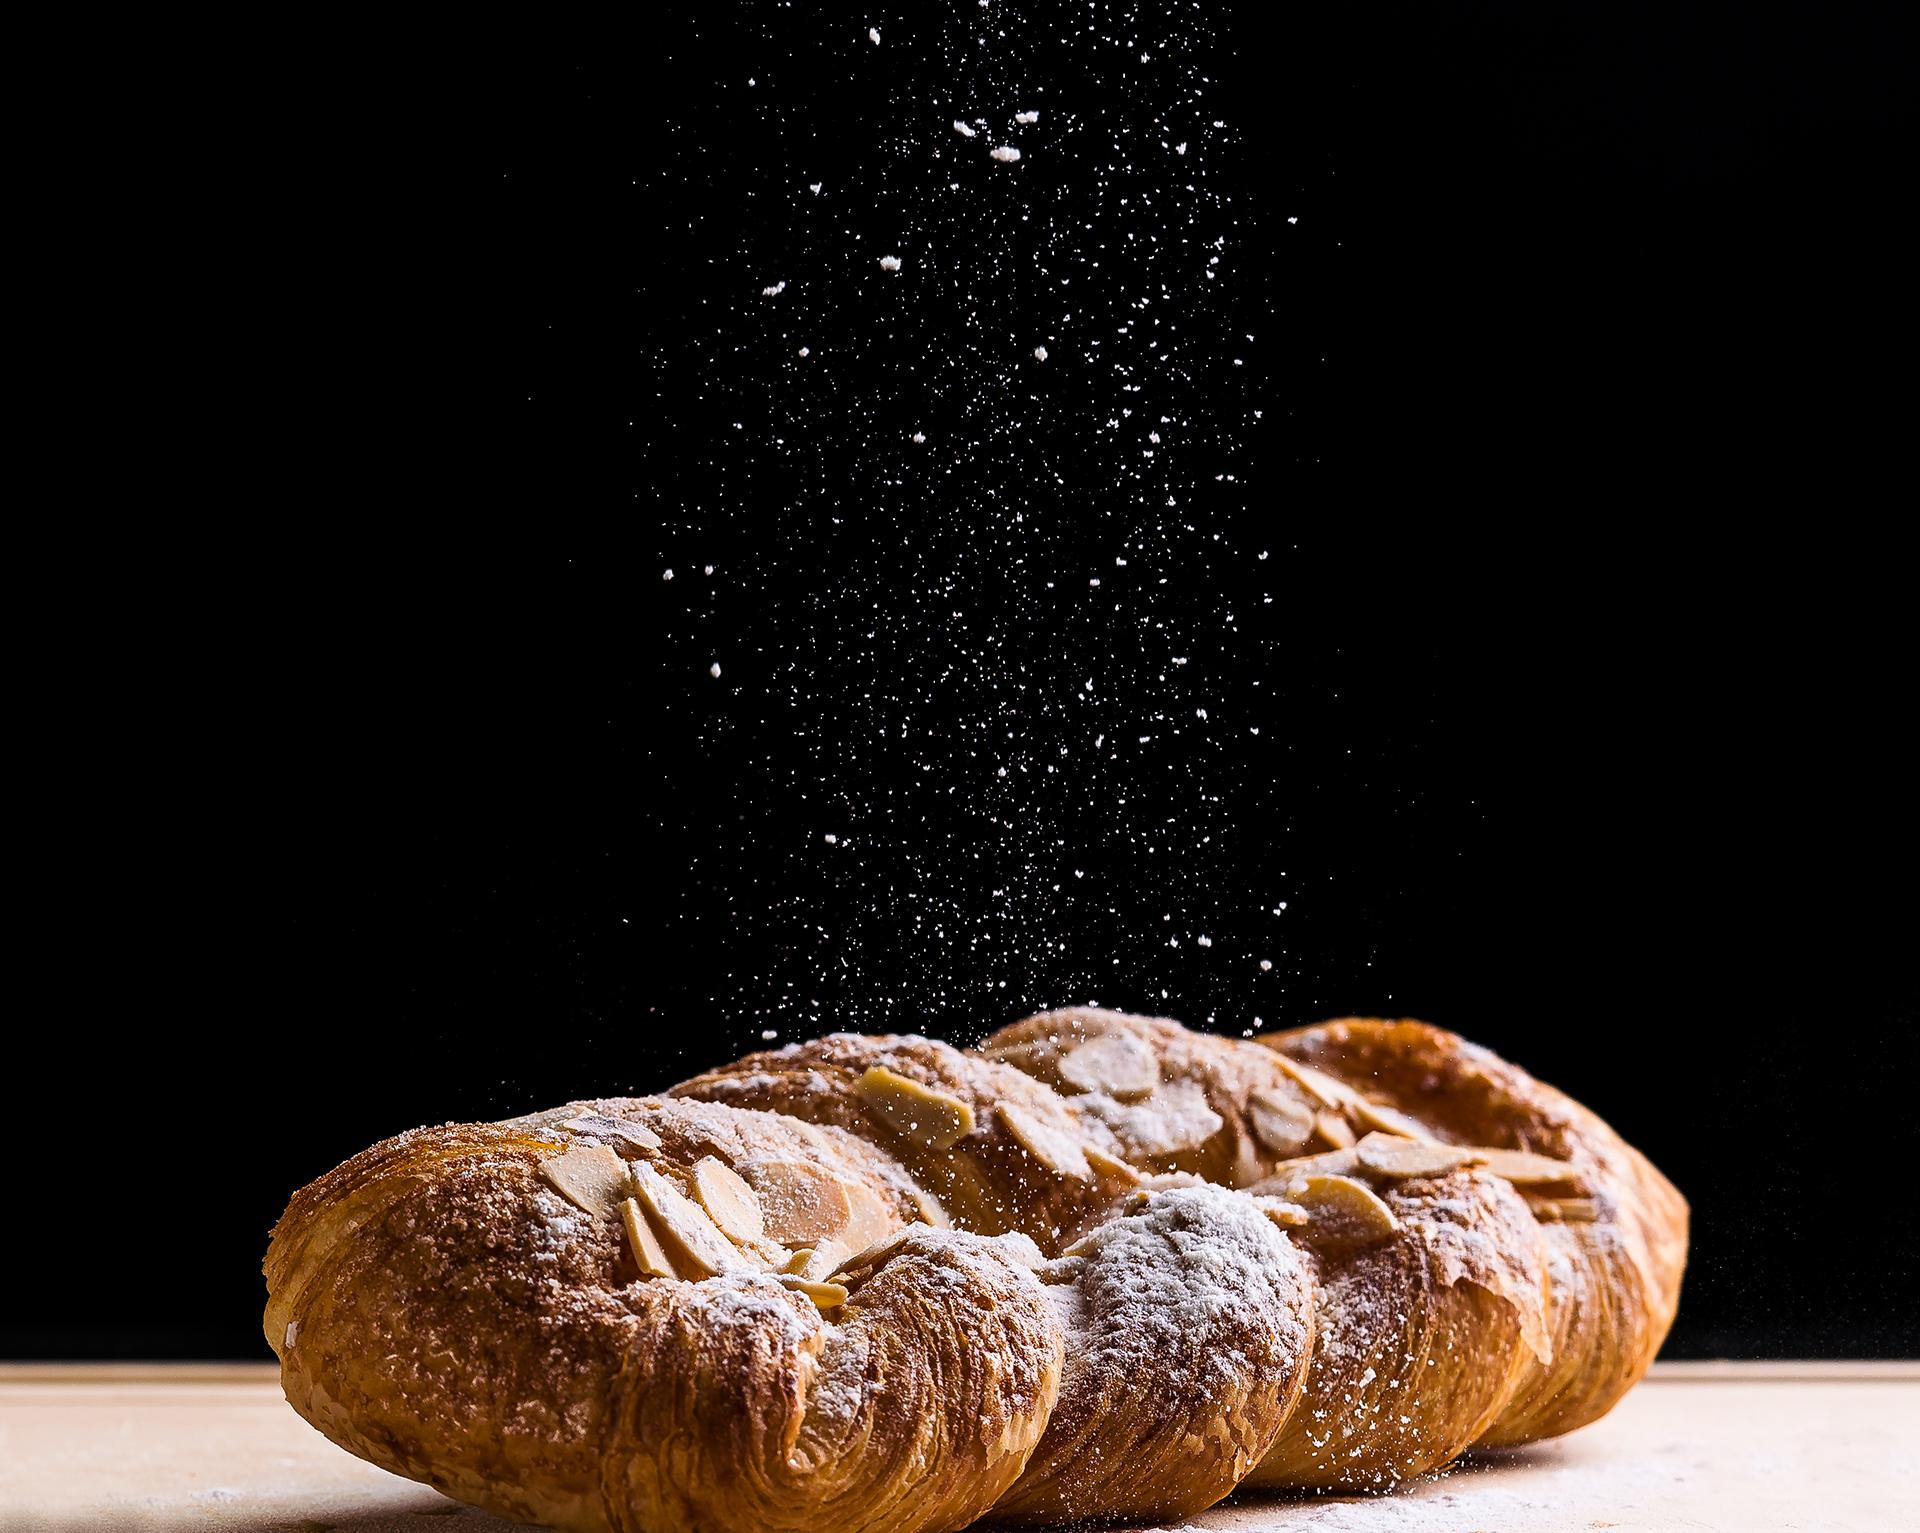 Bake Culture - BRANDING, PRINT, SOCIAL MEDIA